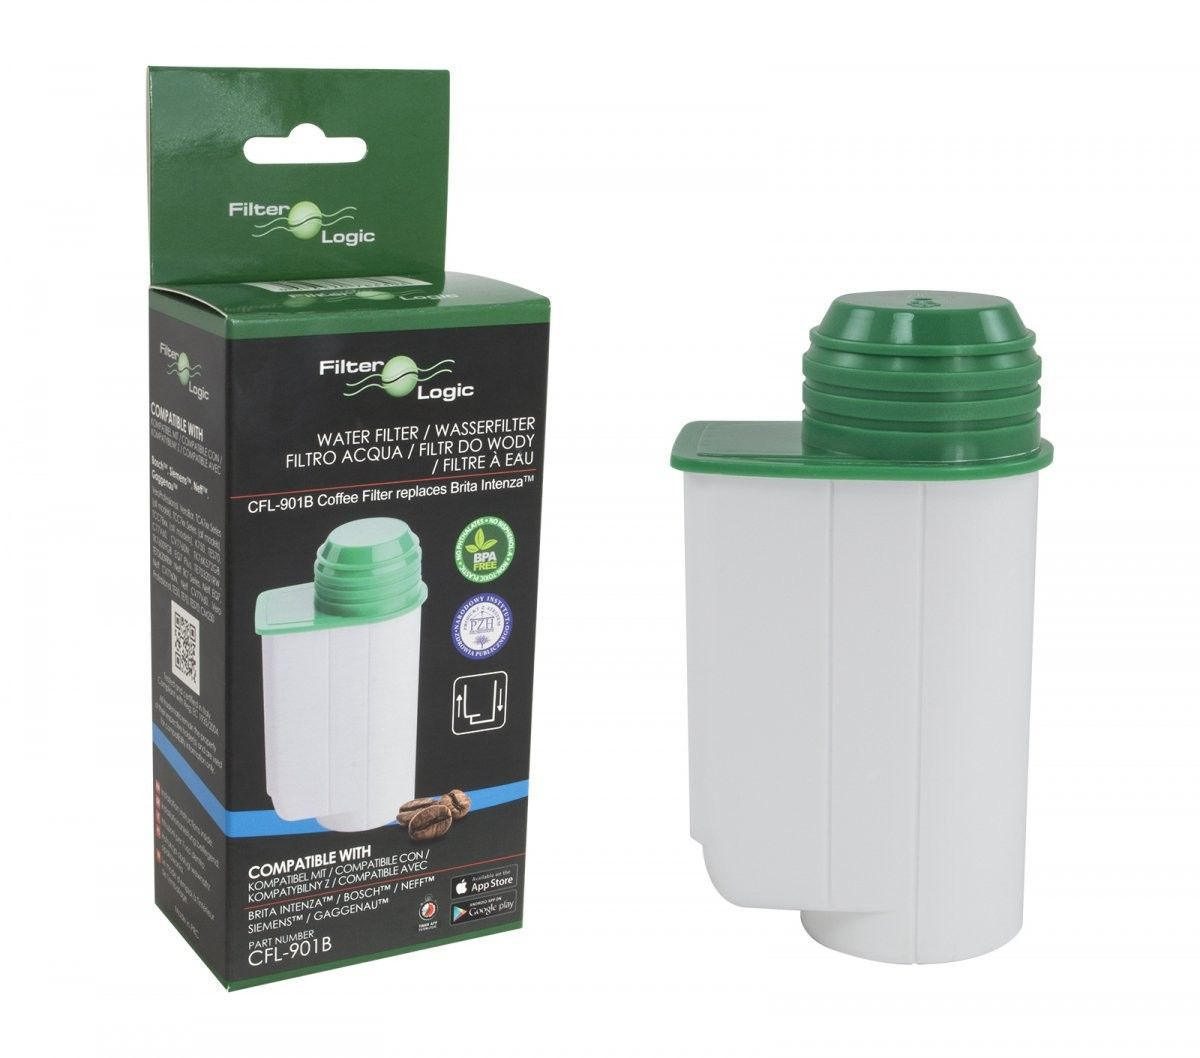 Filtr wody Brita Intenza+ CA6702 ekspresu do kawy FilterLogic